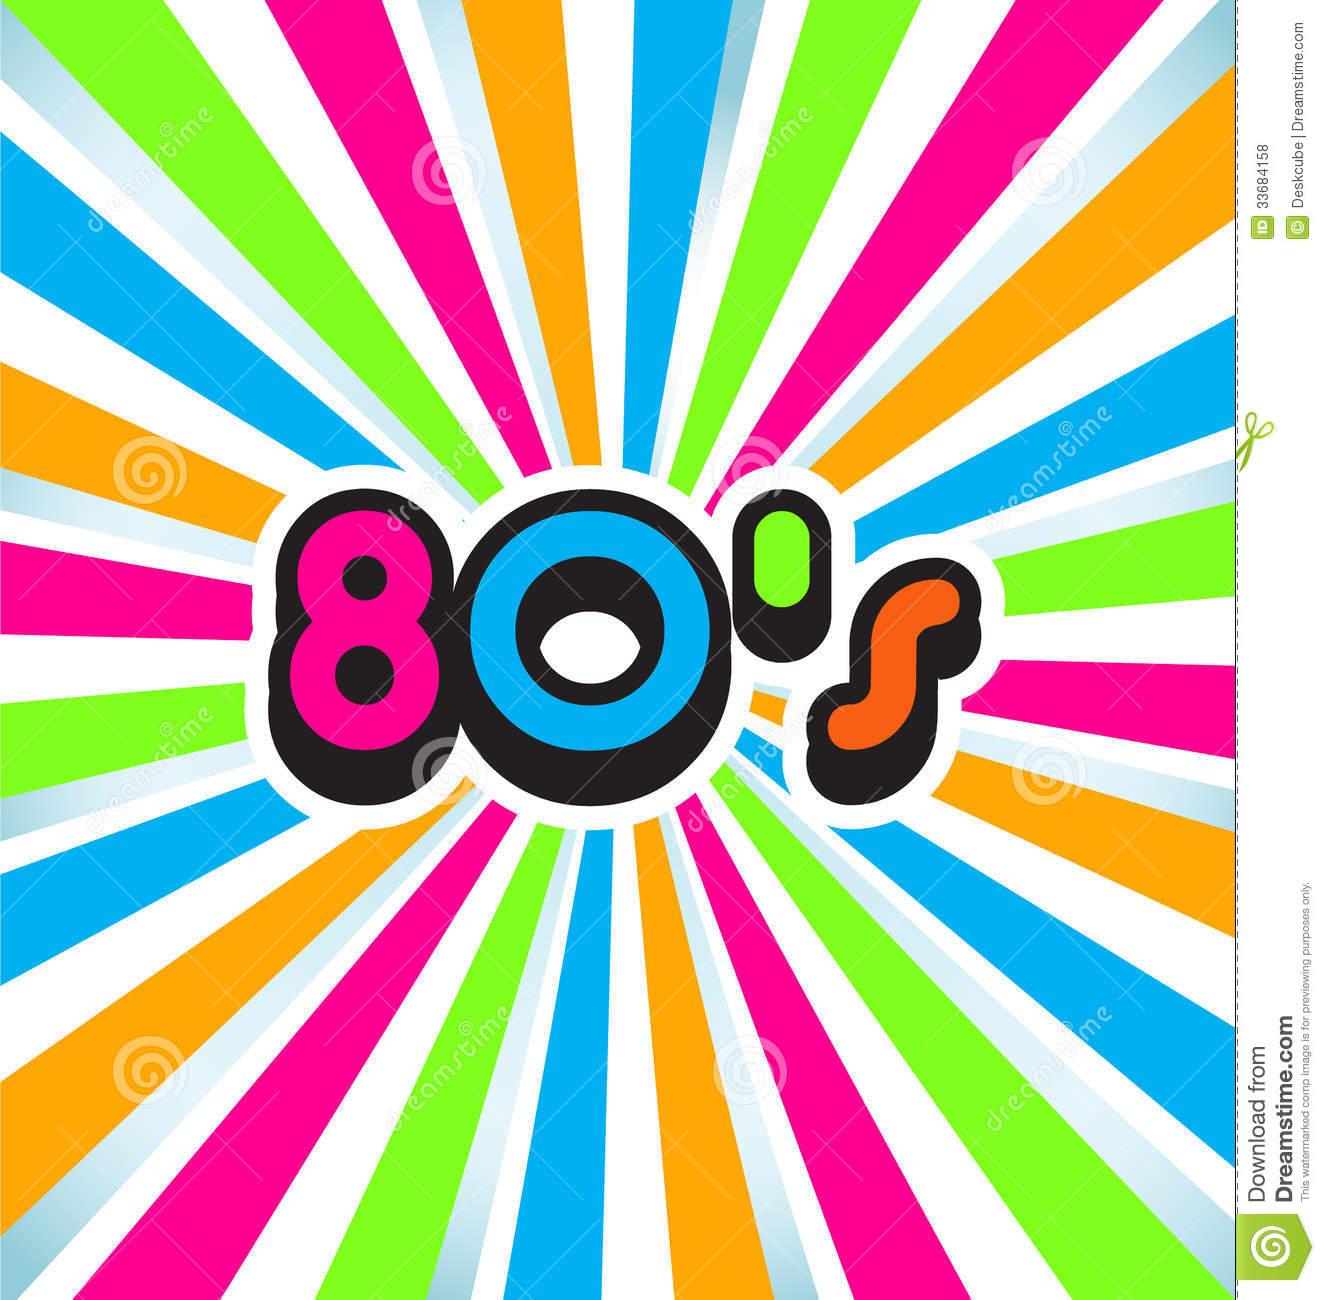 80s Pop Art Background Royalty Free Stock Photos   Image  33684158